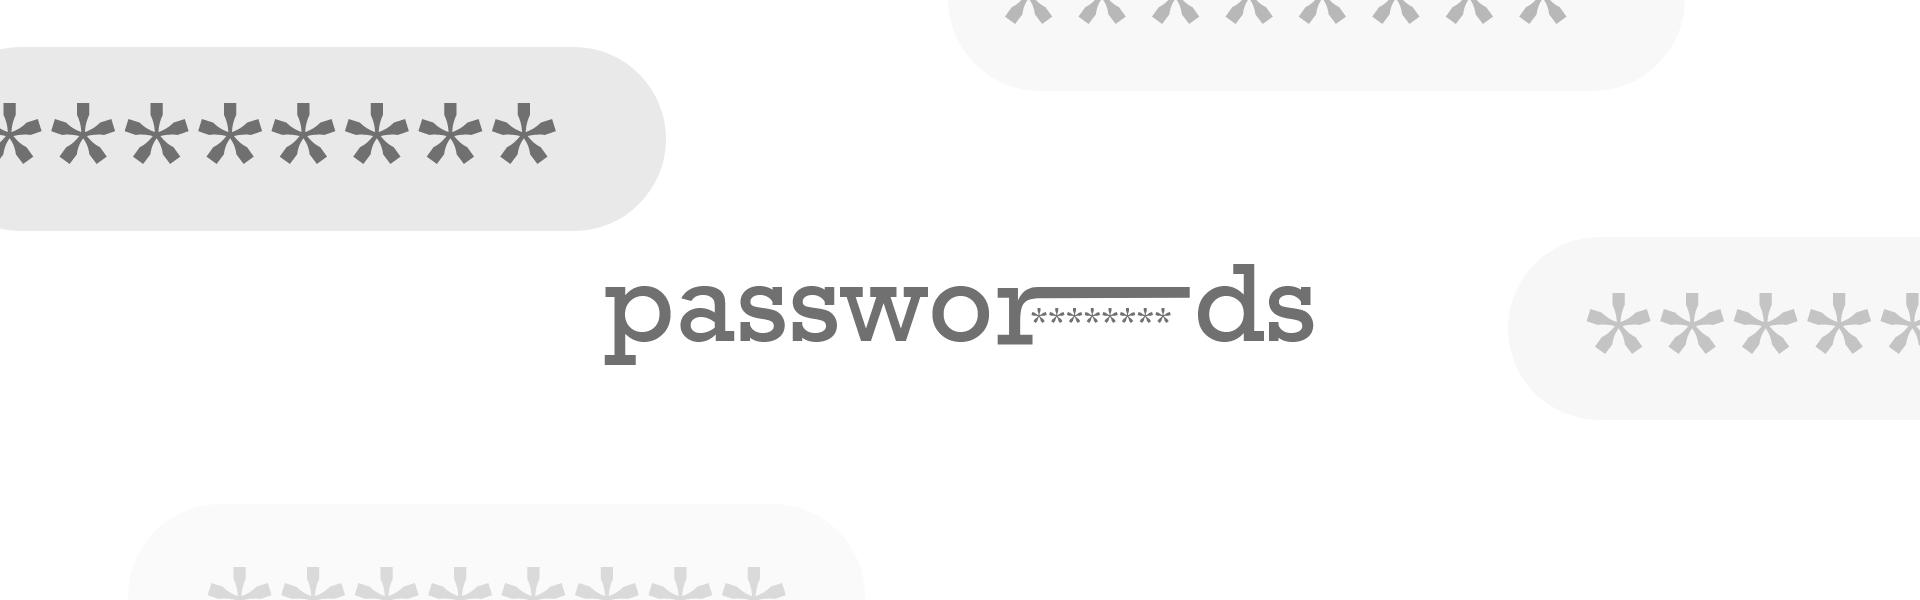 Free Websta Premium Account and Password